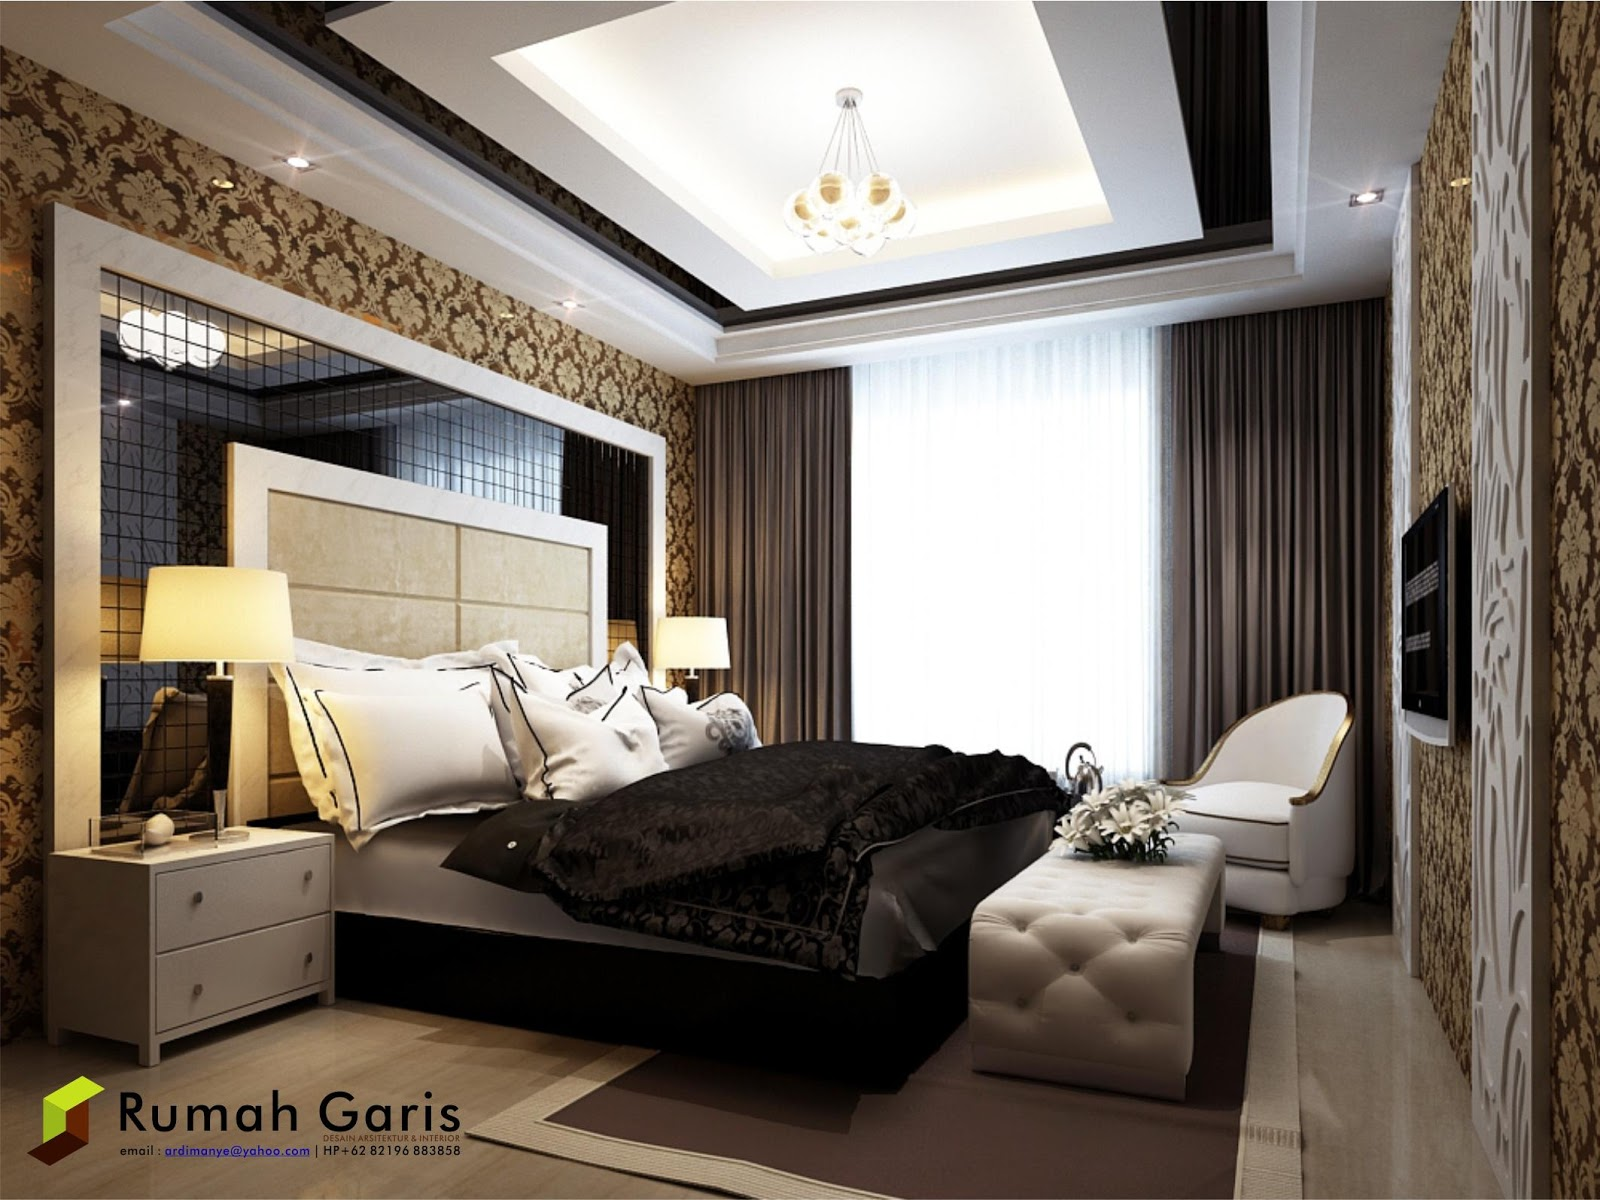 Design interior kamar minimalis - Interior Kamar Tidur Modern Minimalis Desain Makassar Jpg 1600 1200 Living Room Pinterest Living Rooms And Room